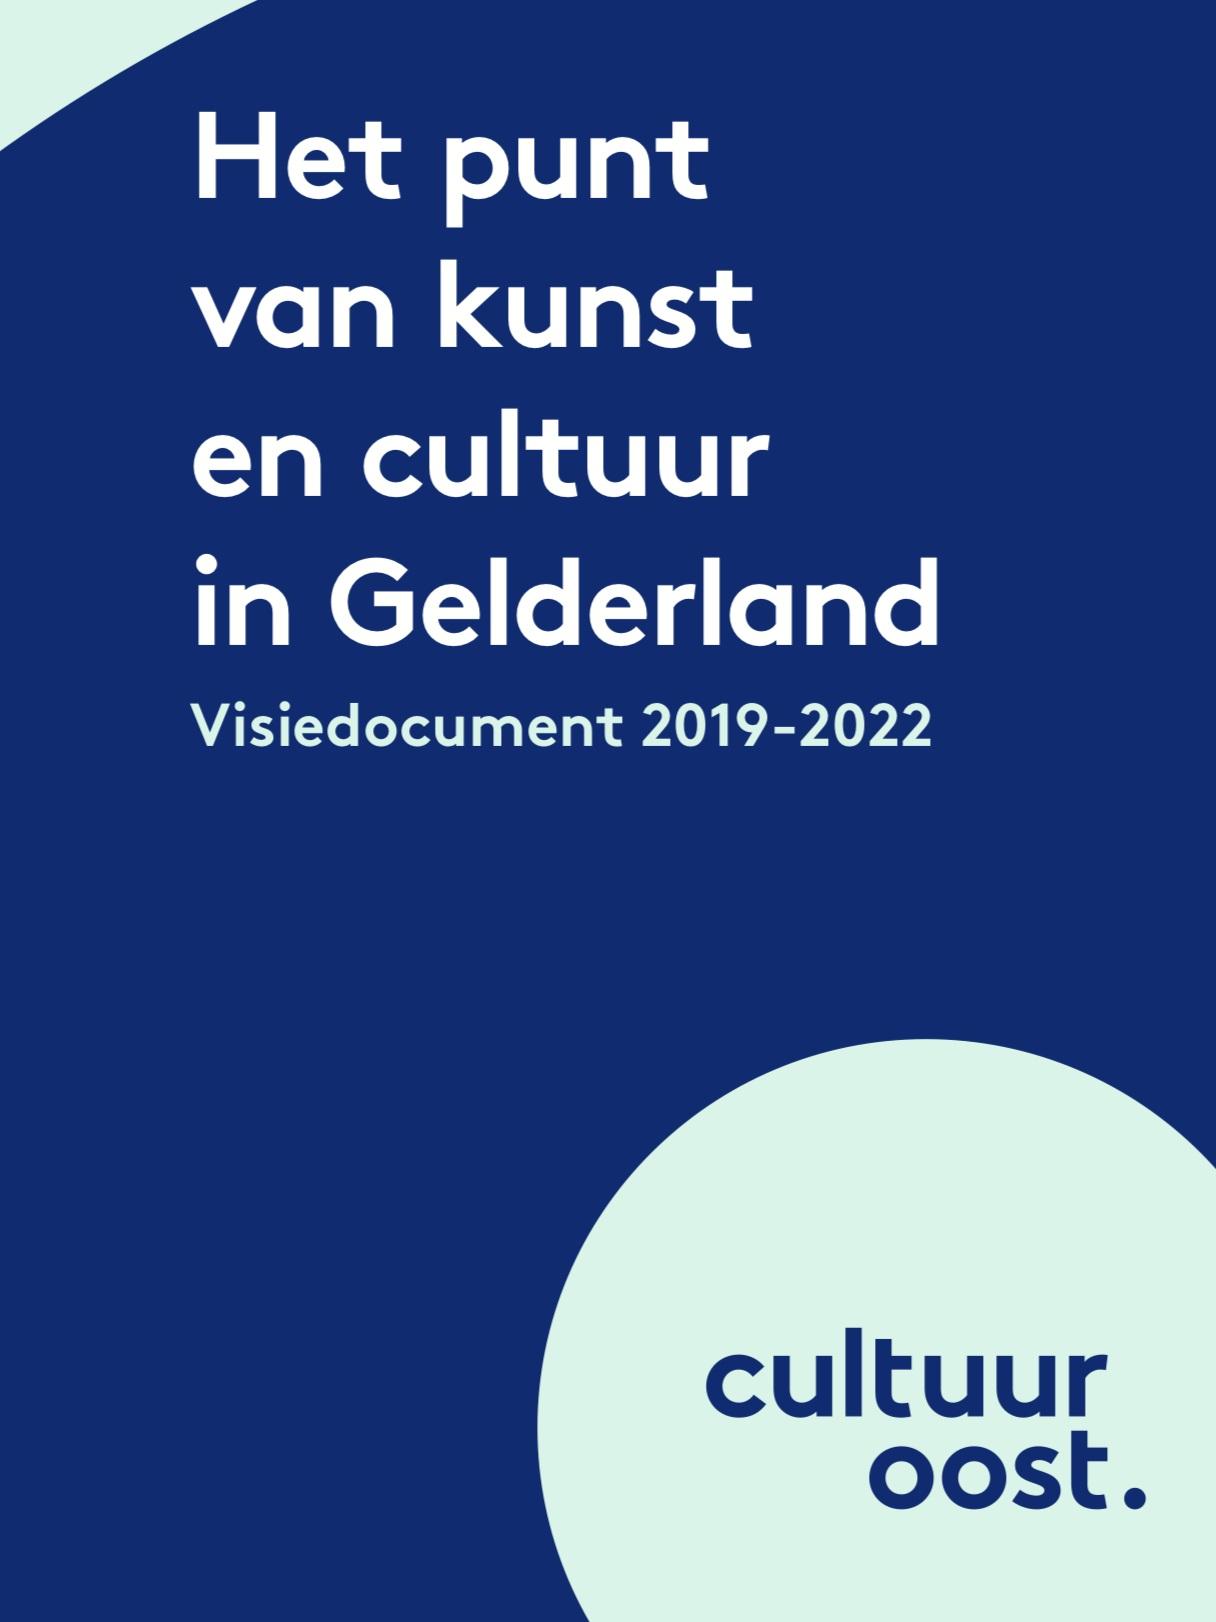 Visidocument+Cultuur+Oost